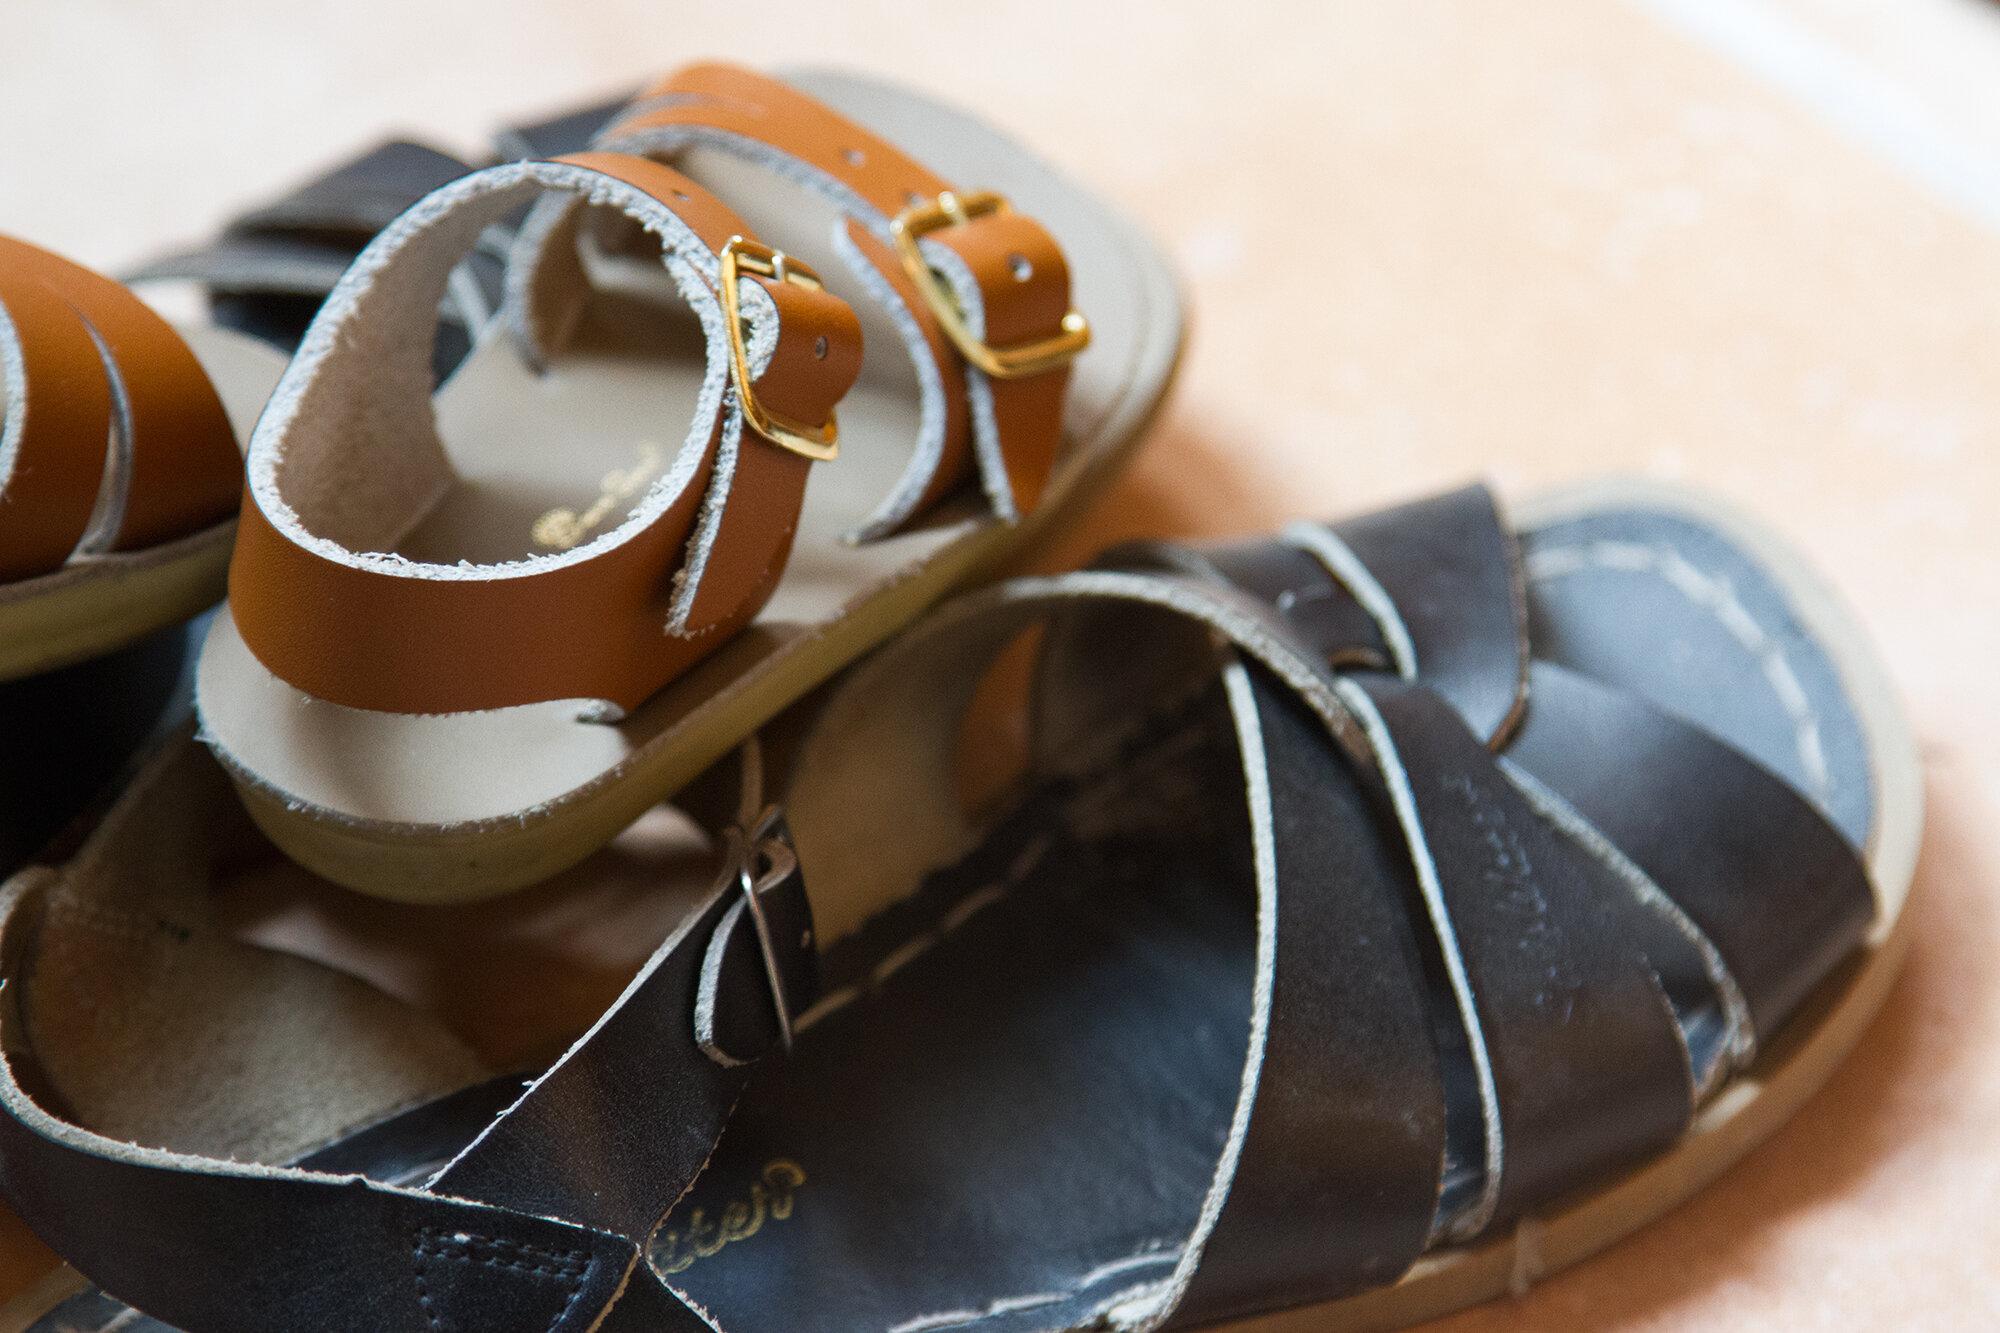 sandals_reading_my_tea_leaves_IMG_1194